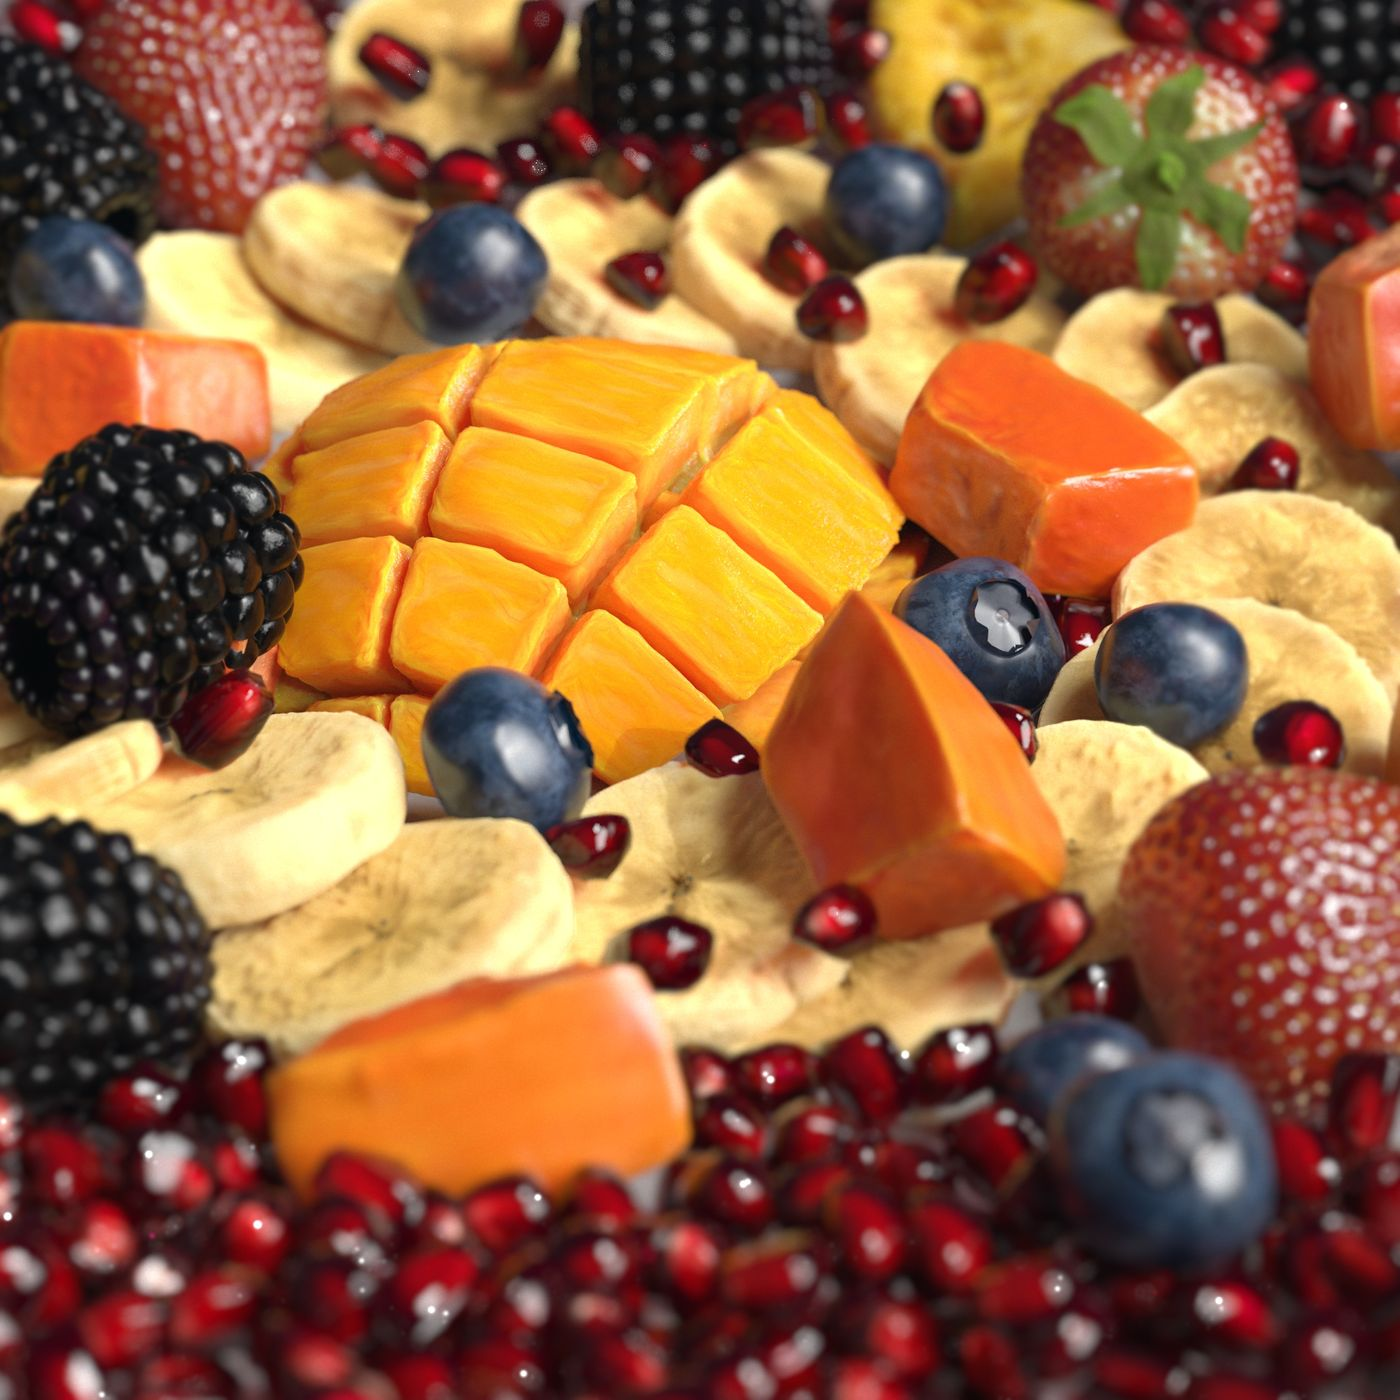 Fresh Fruits Vedaprashanth61